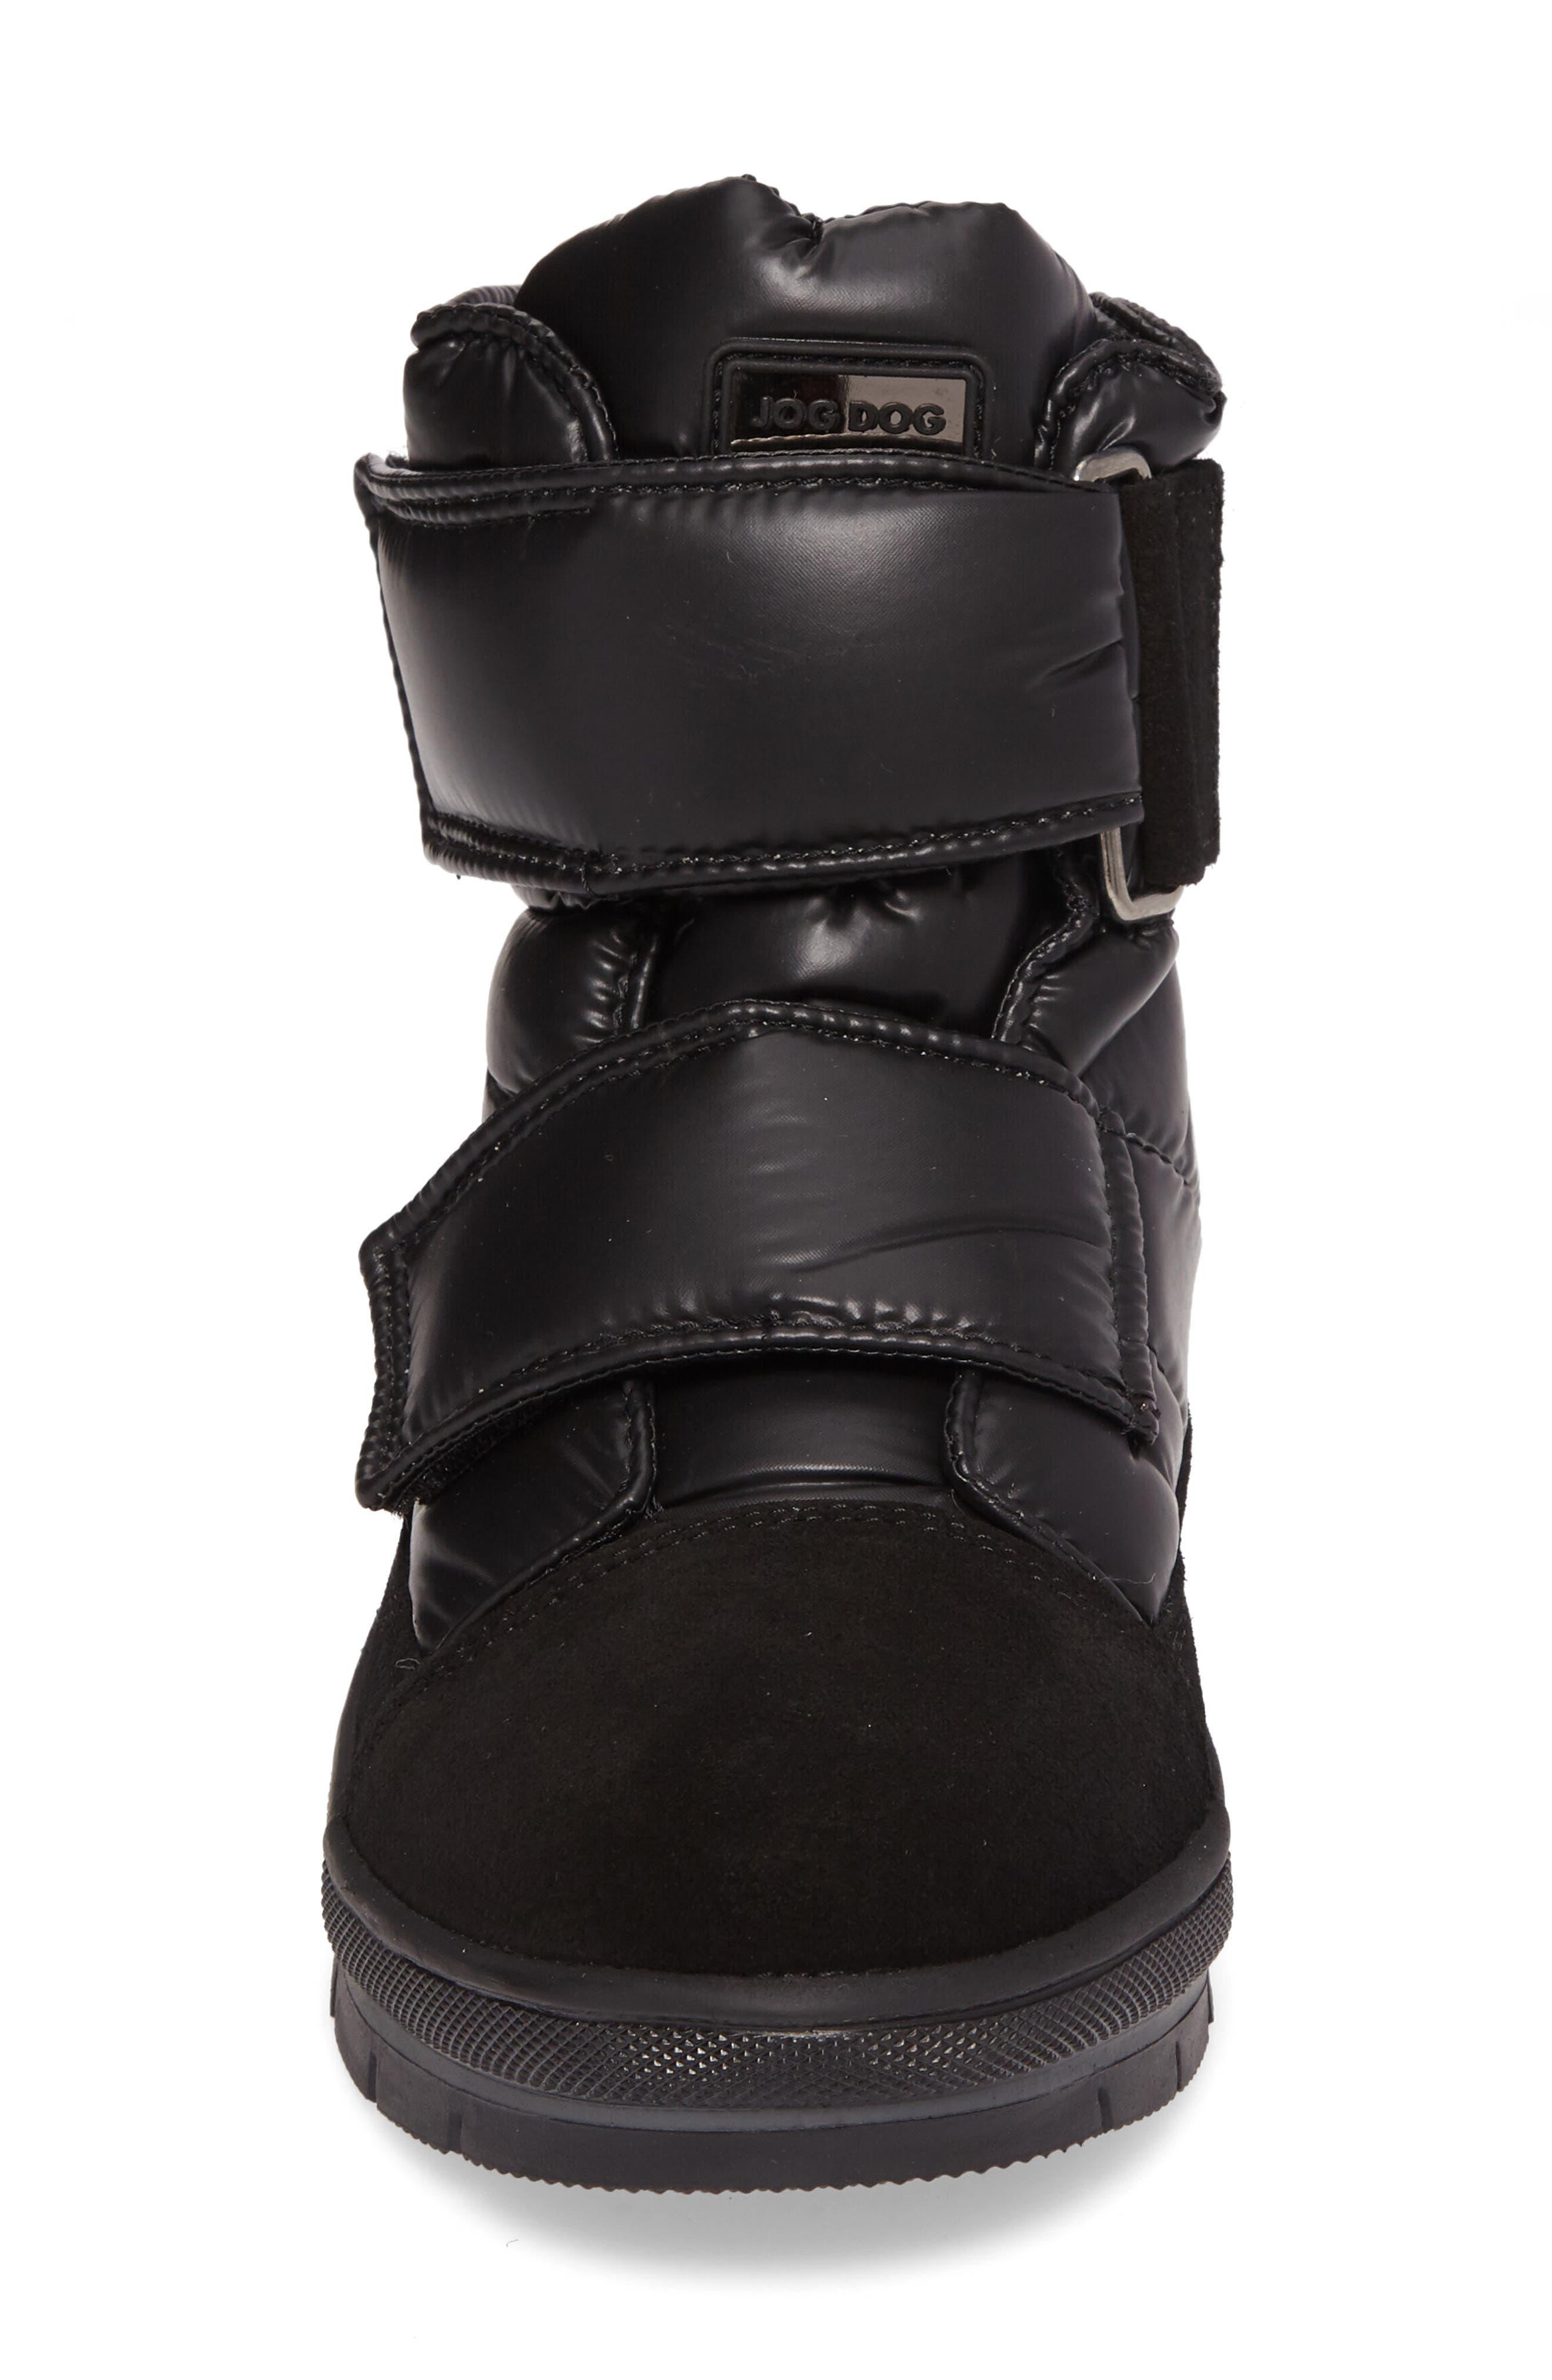 Gran Sasso Waterproof Boot,                             Alternate thumbnail 4, color,                             Black Baltico